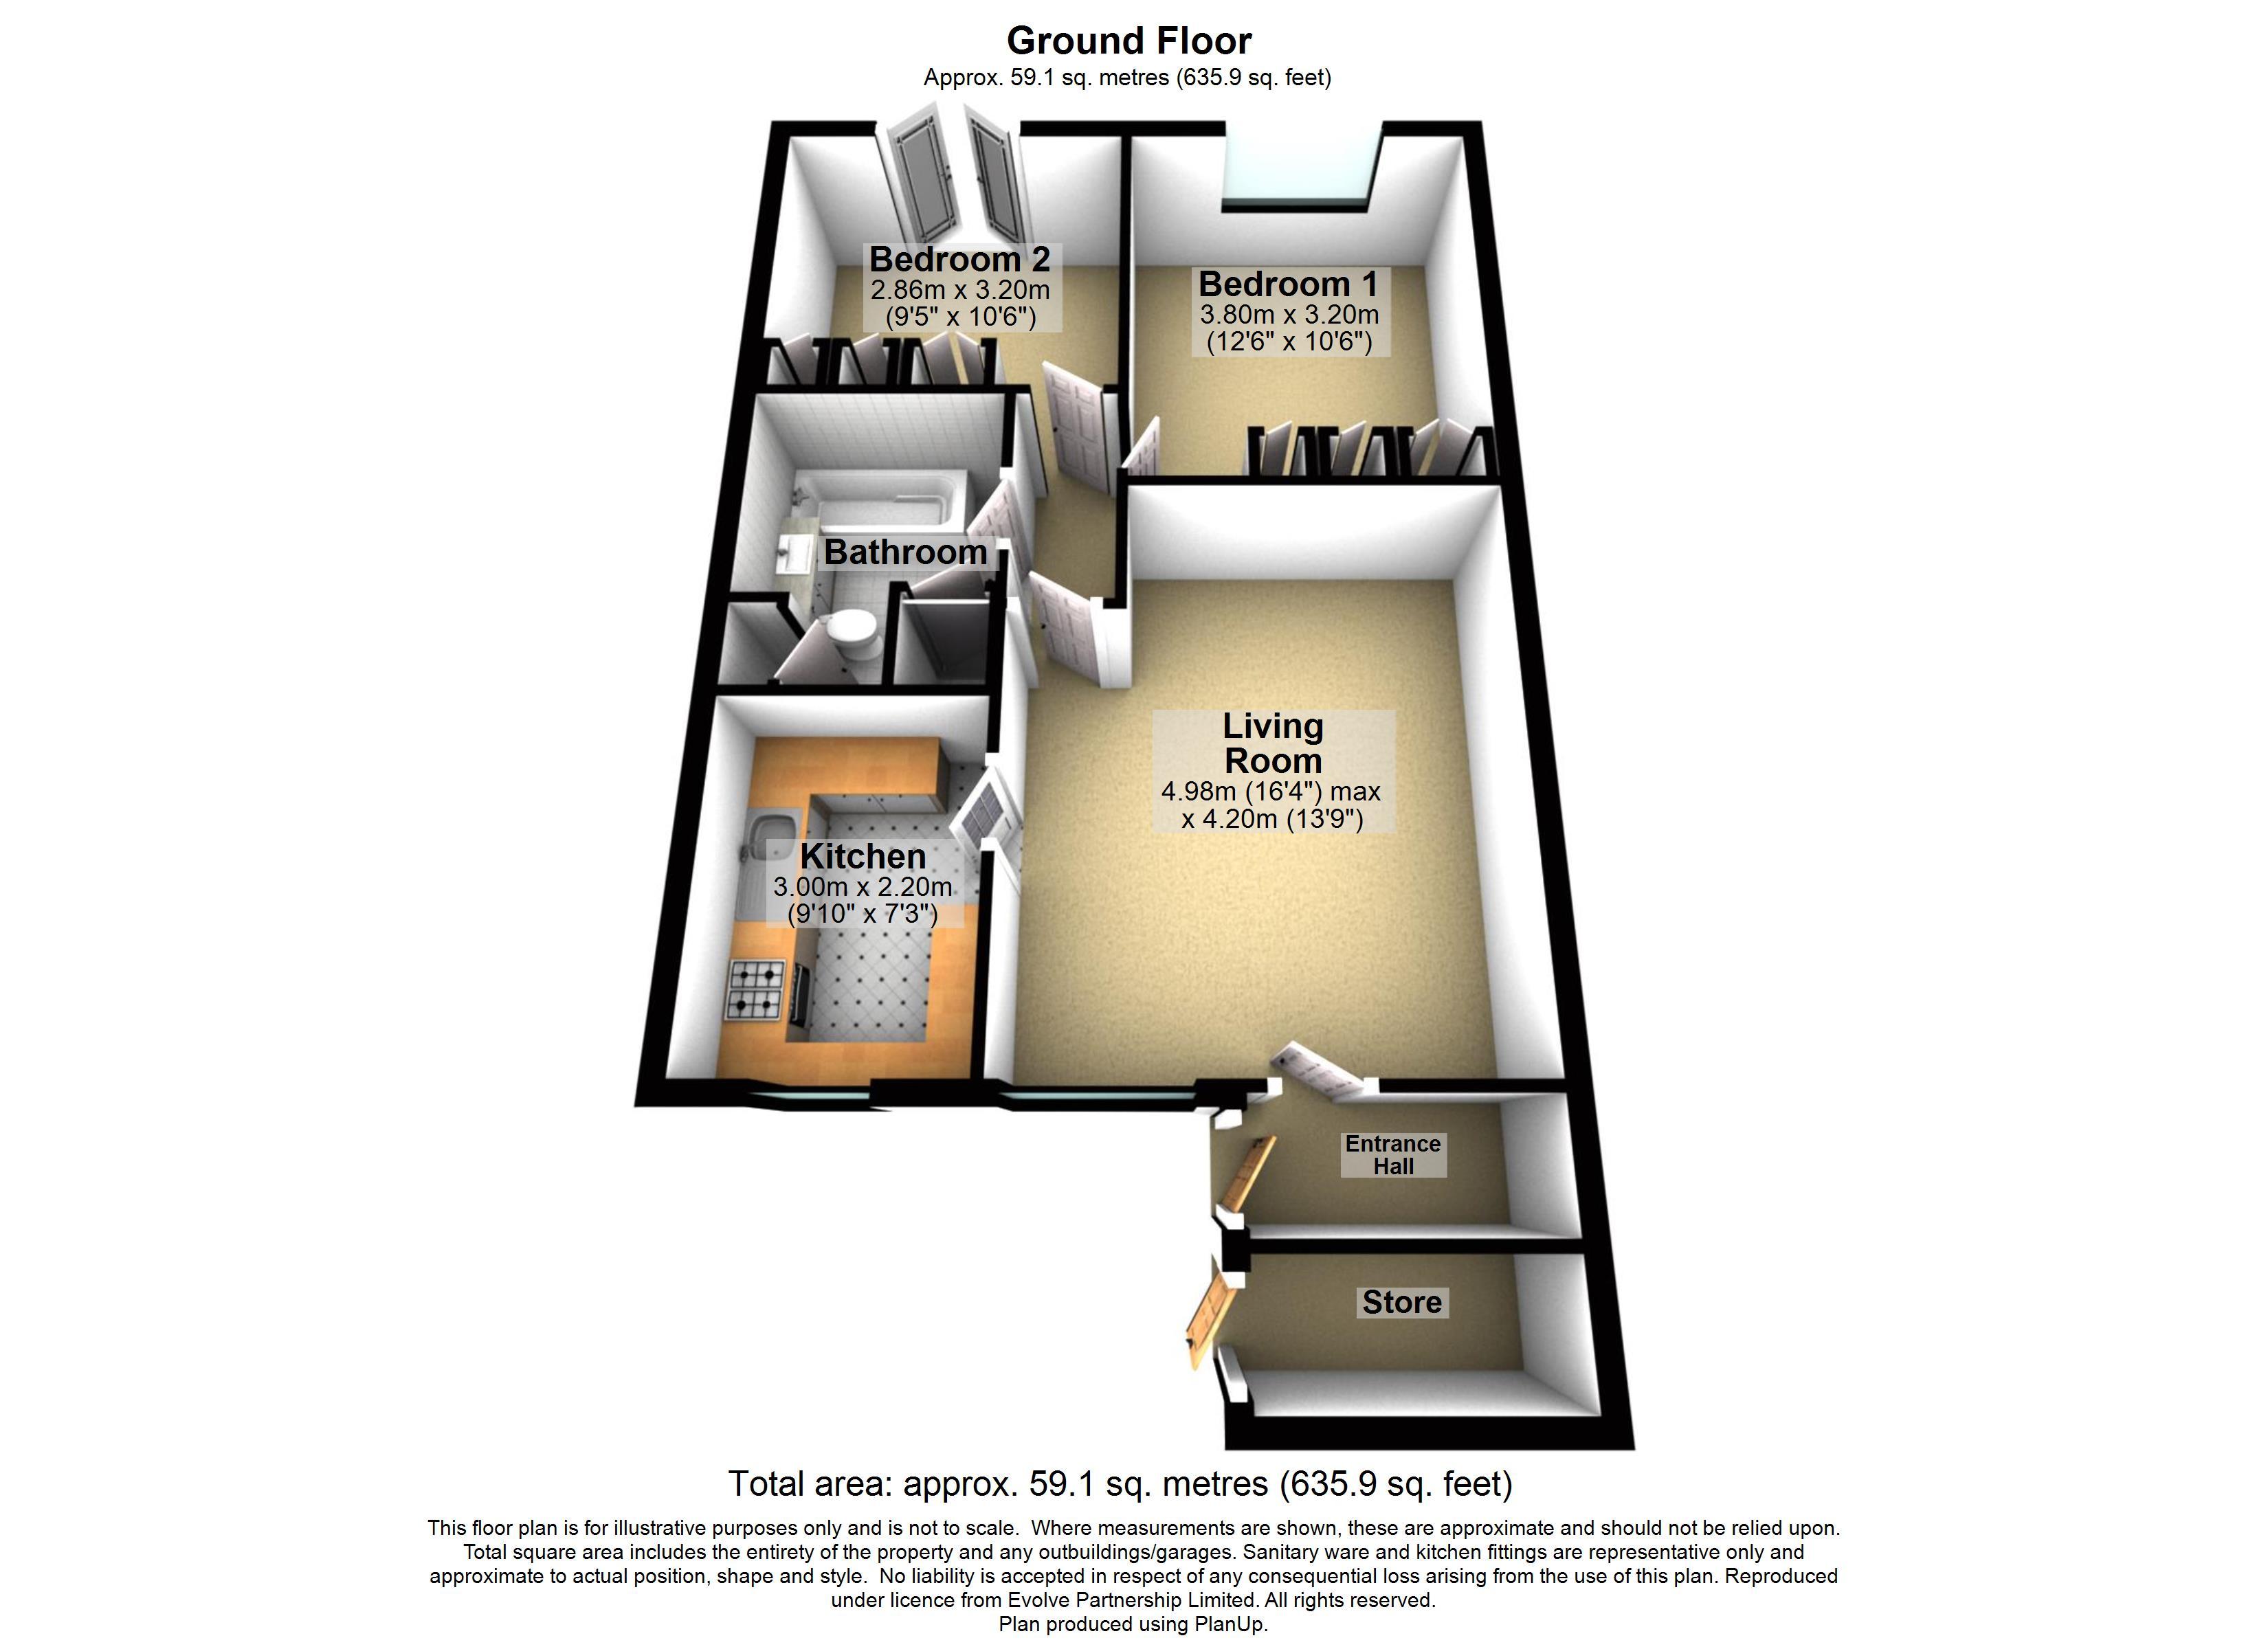 12 Ilford Court Floorplan